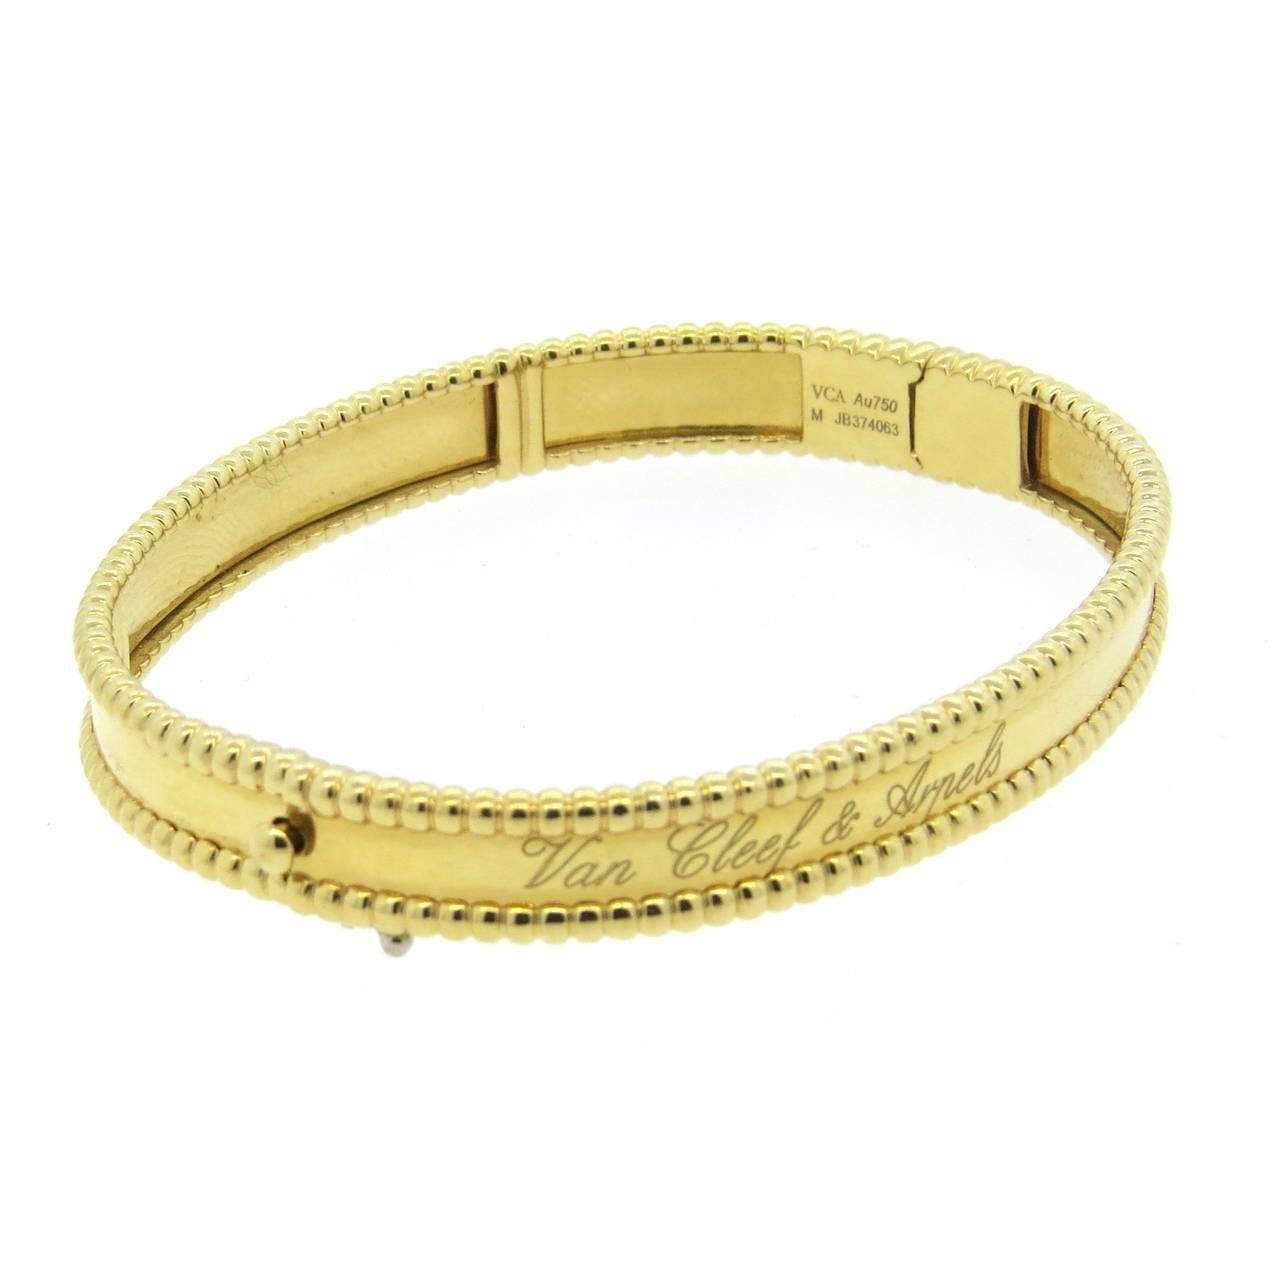 Van Cleef And Arpels Perlee Signature Gold Bangle Bracelet